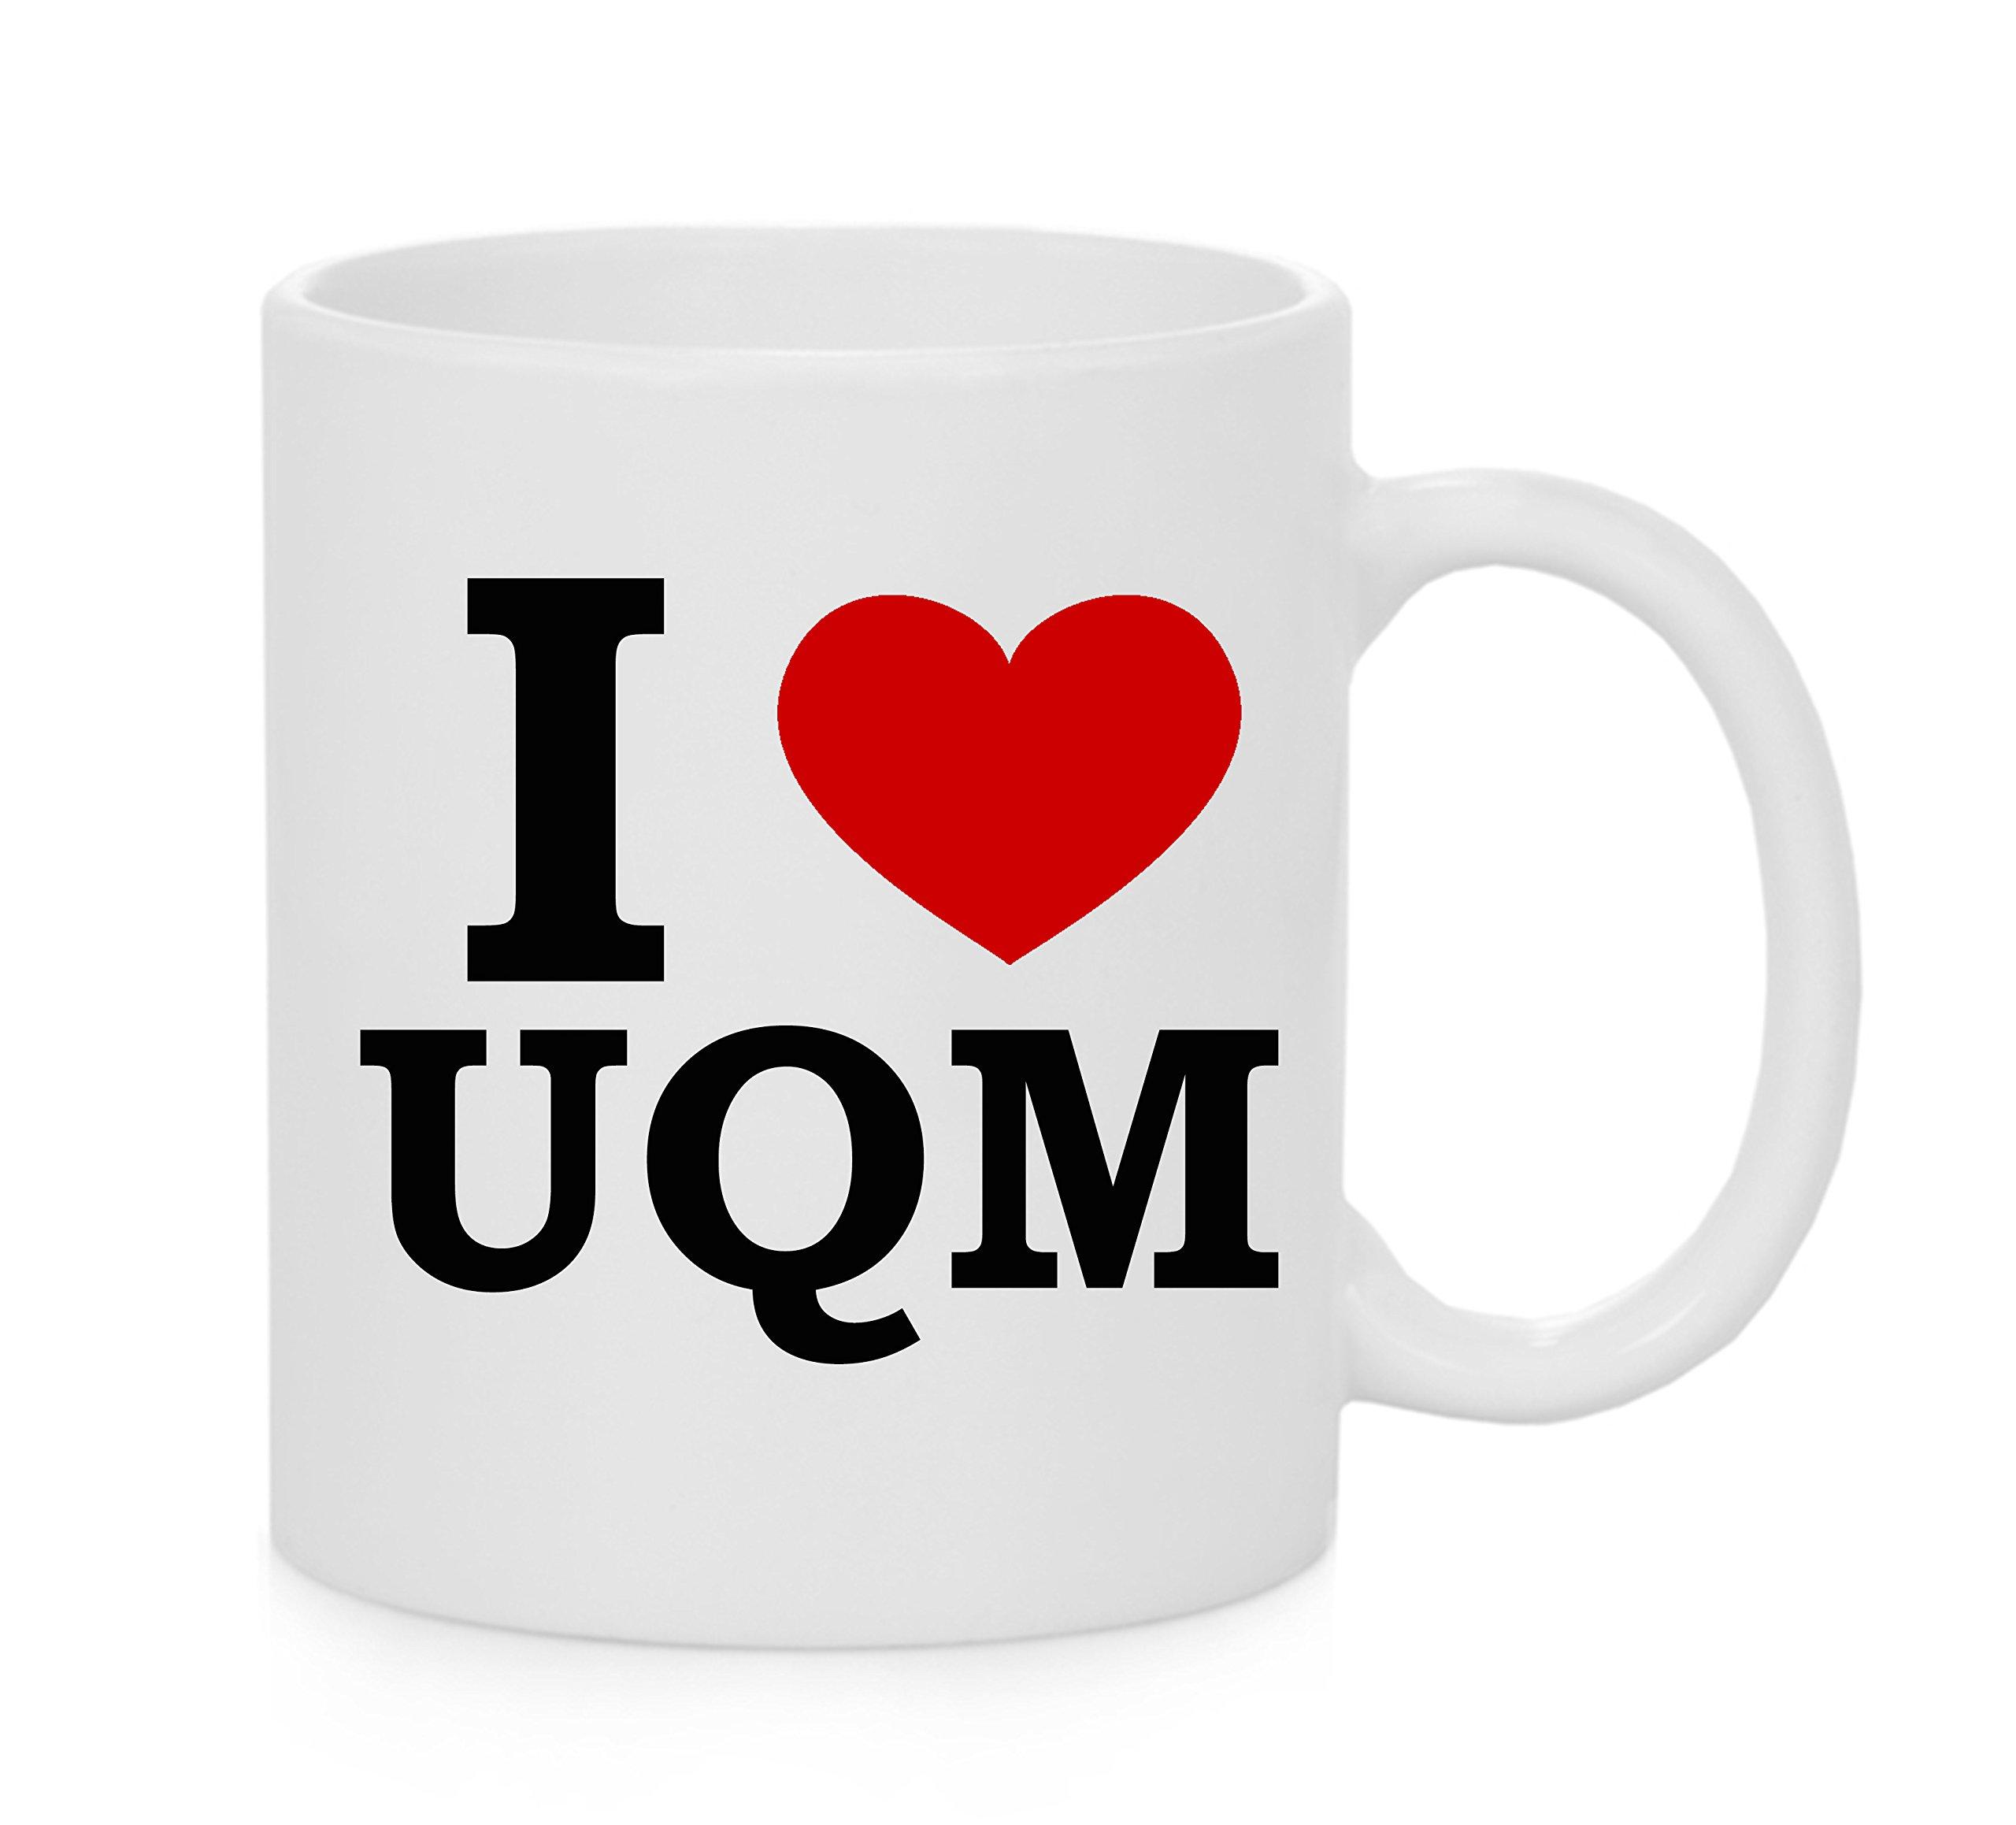 Buy Uqm Now!